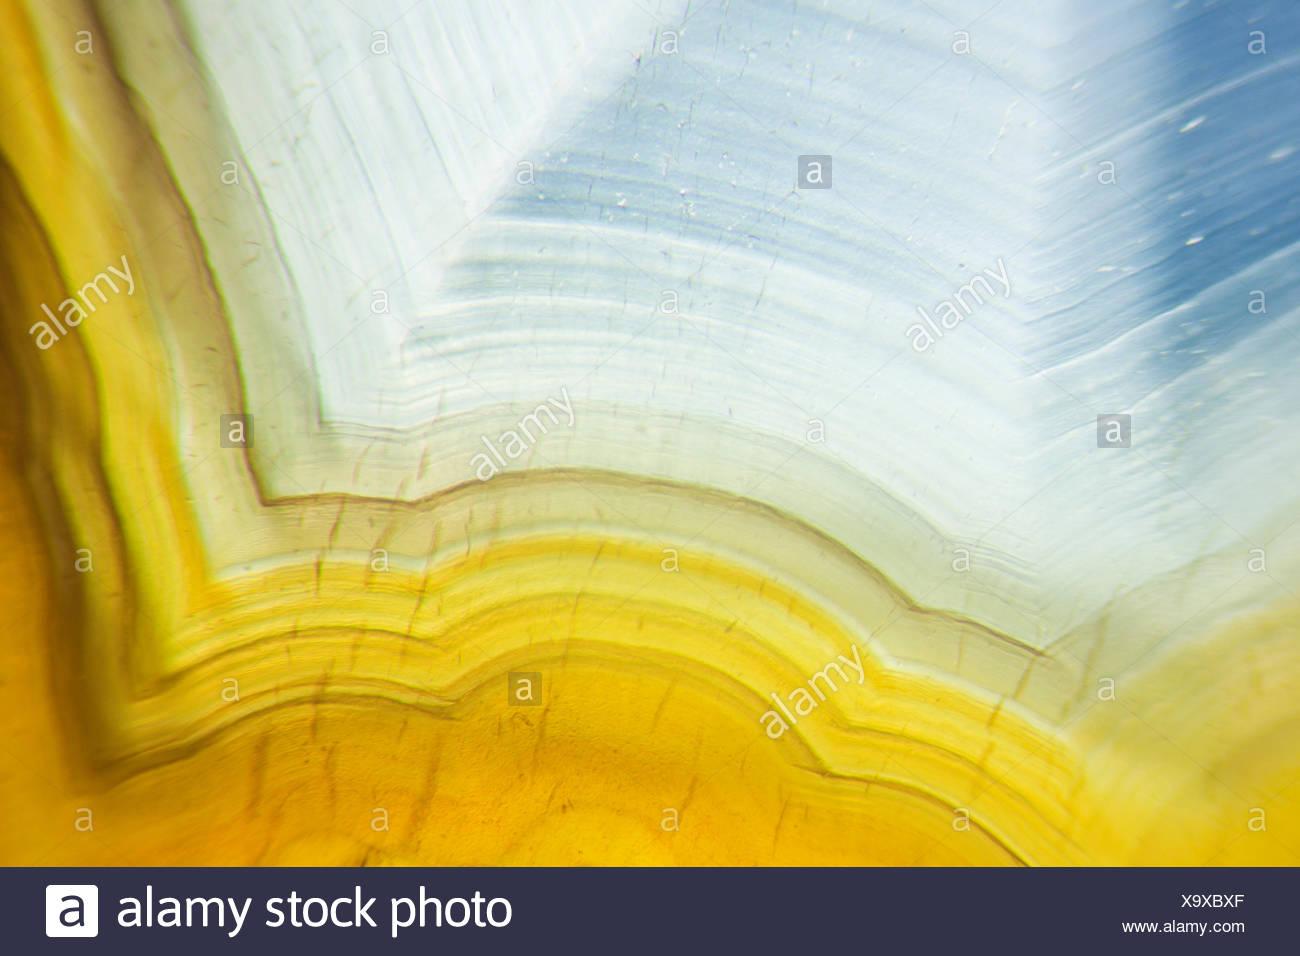 Microfotografía de un disco de ágata con luz transmitida Foto de stock